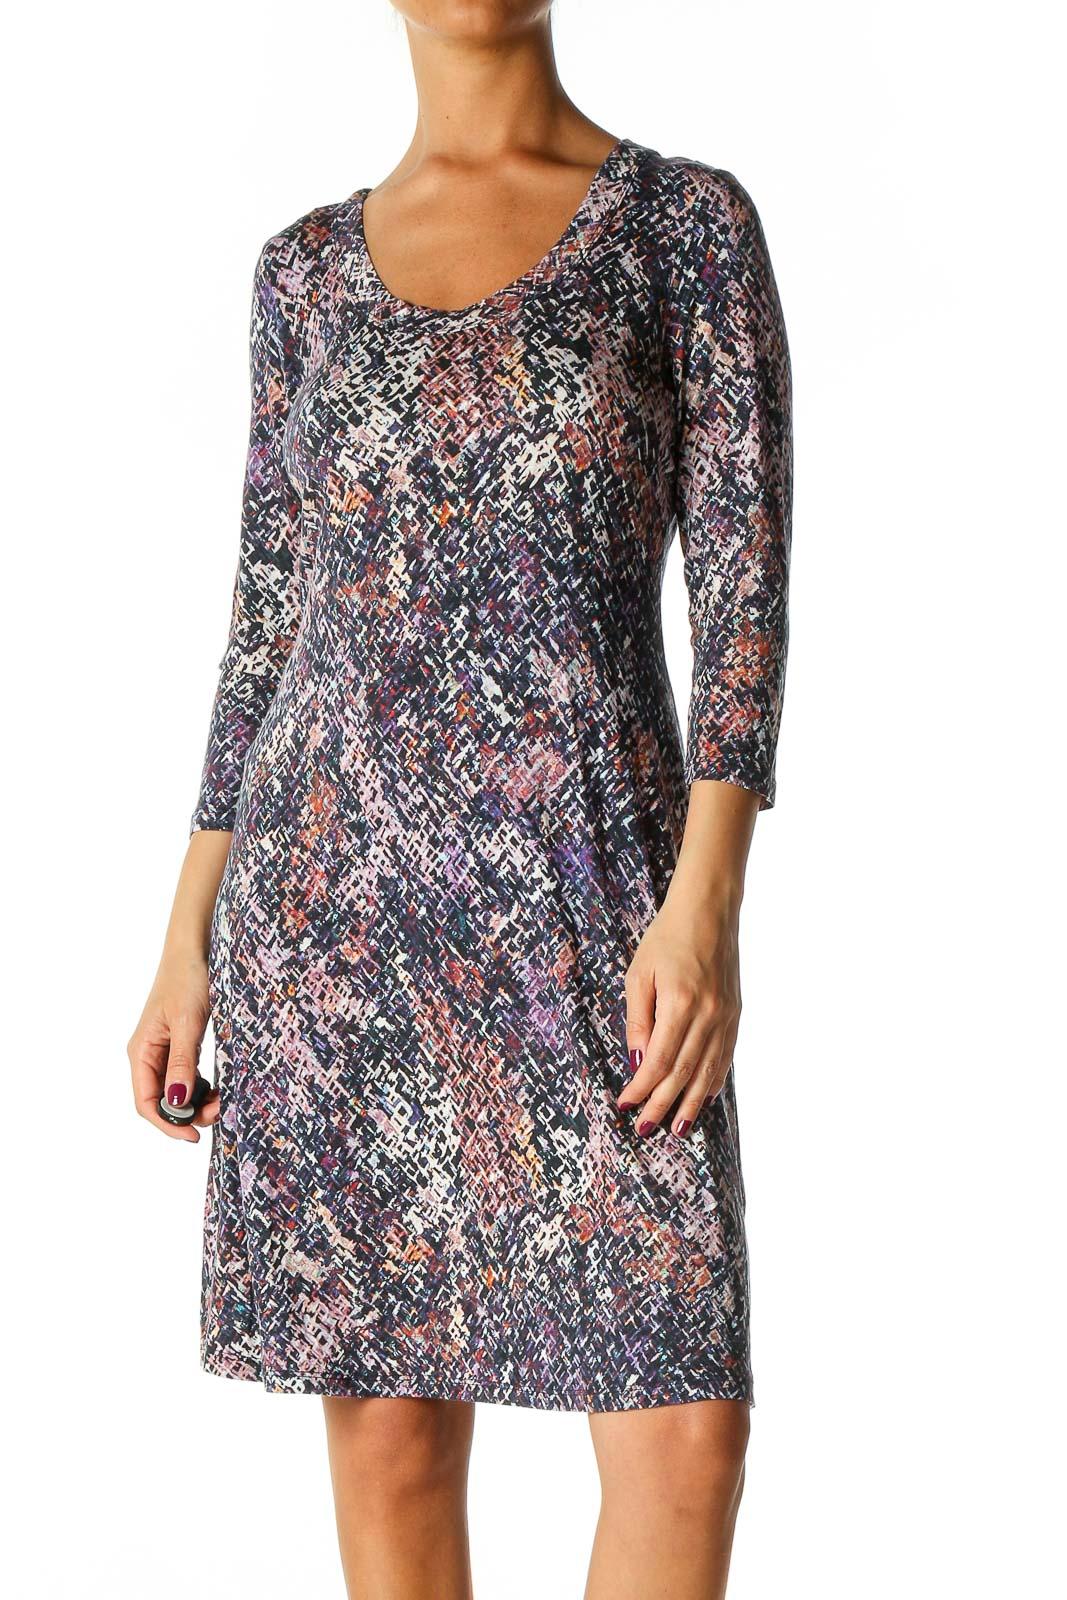 Purple Bohemian A-Line Dress Front